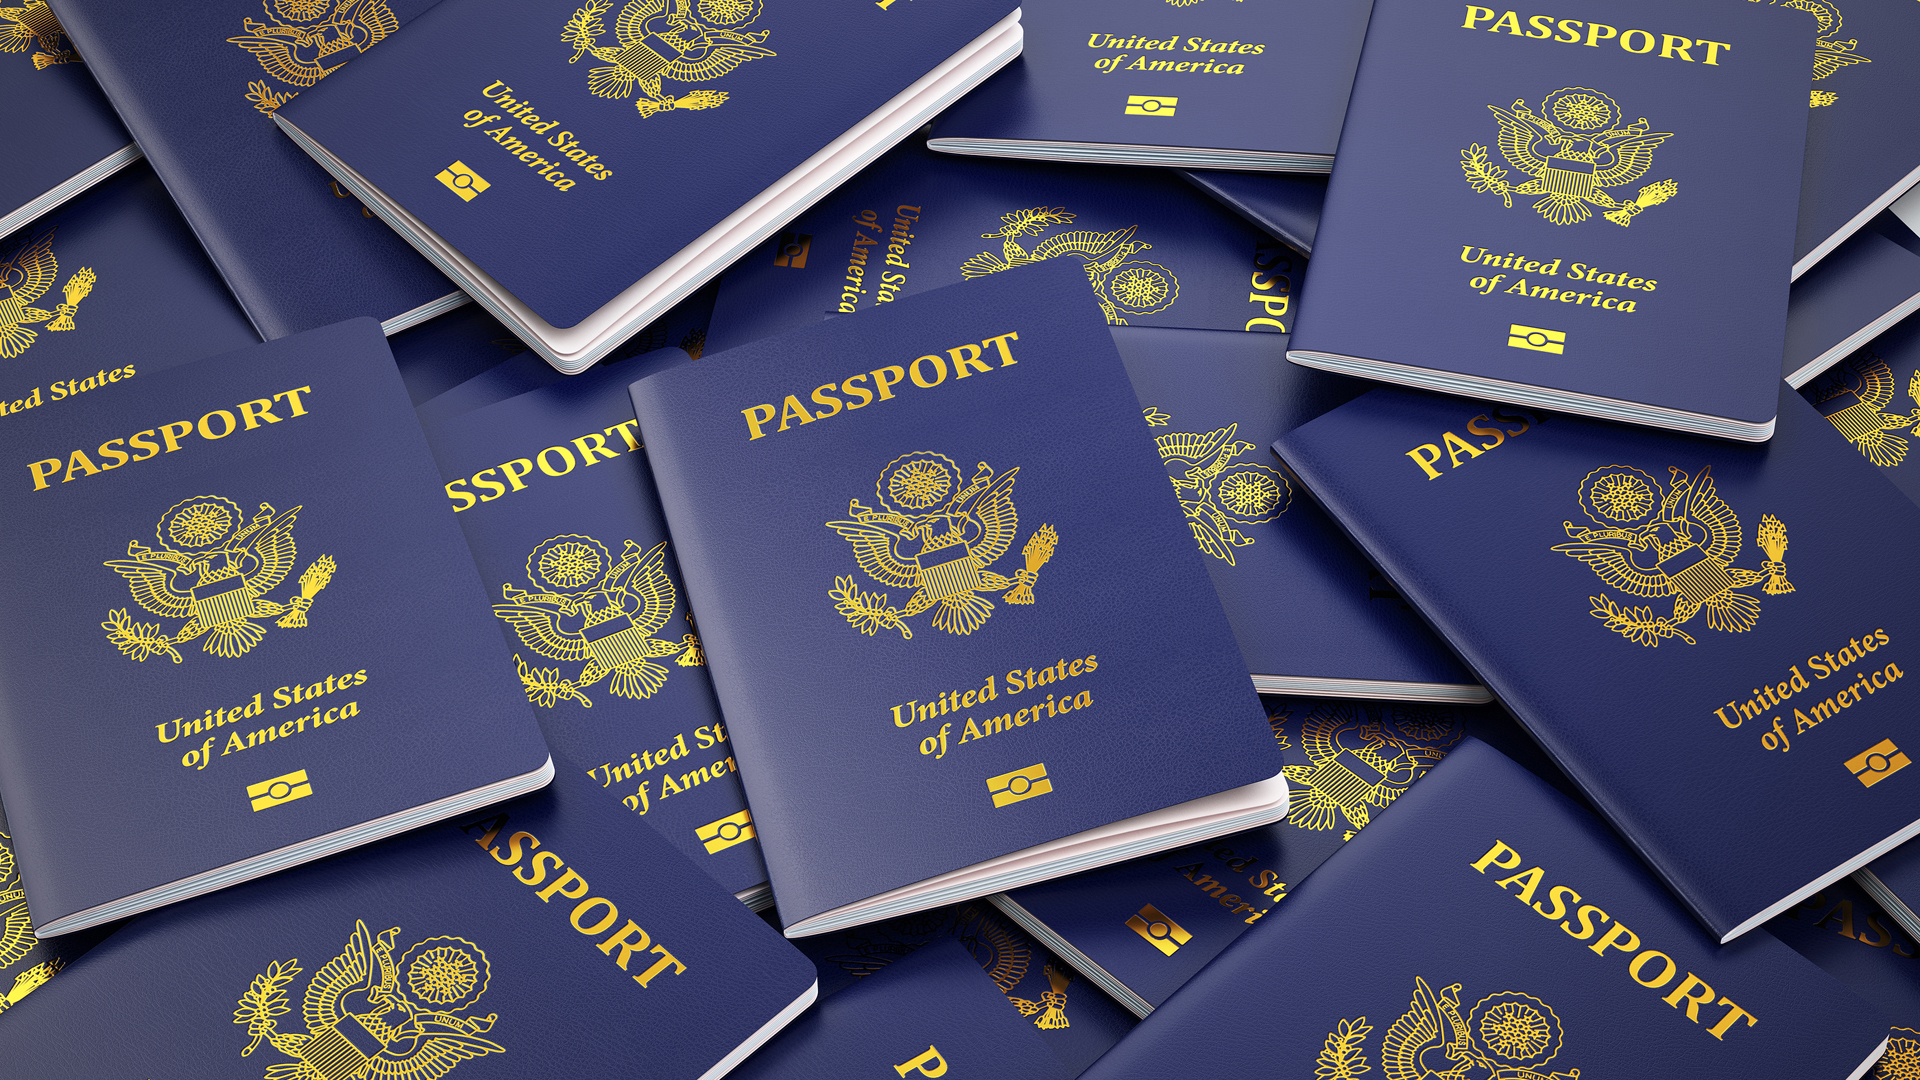 USA passport background. Immigration or travel concept. 3d illus_1526046642177